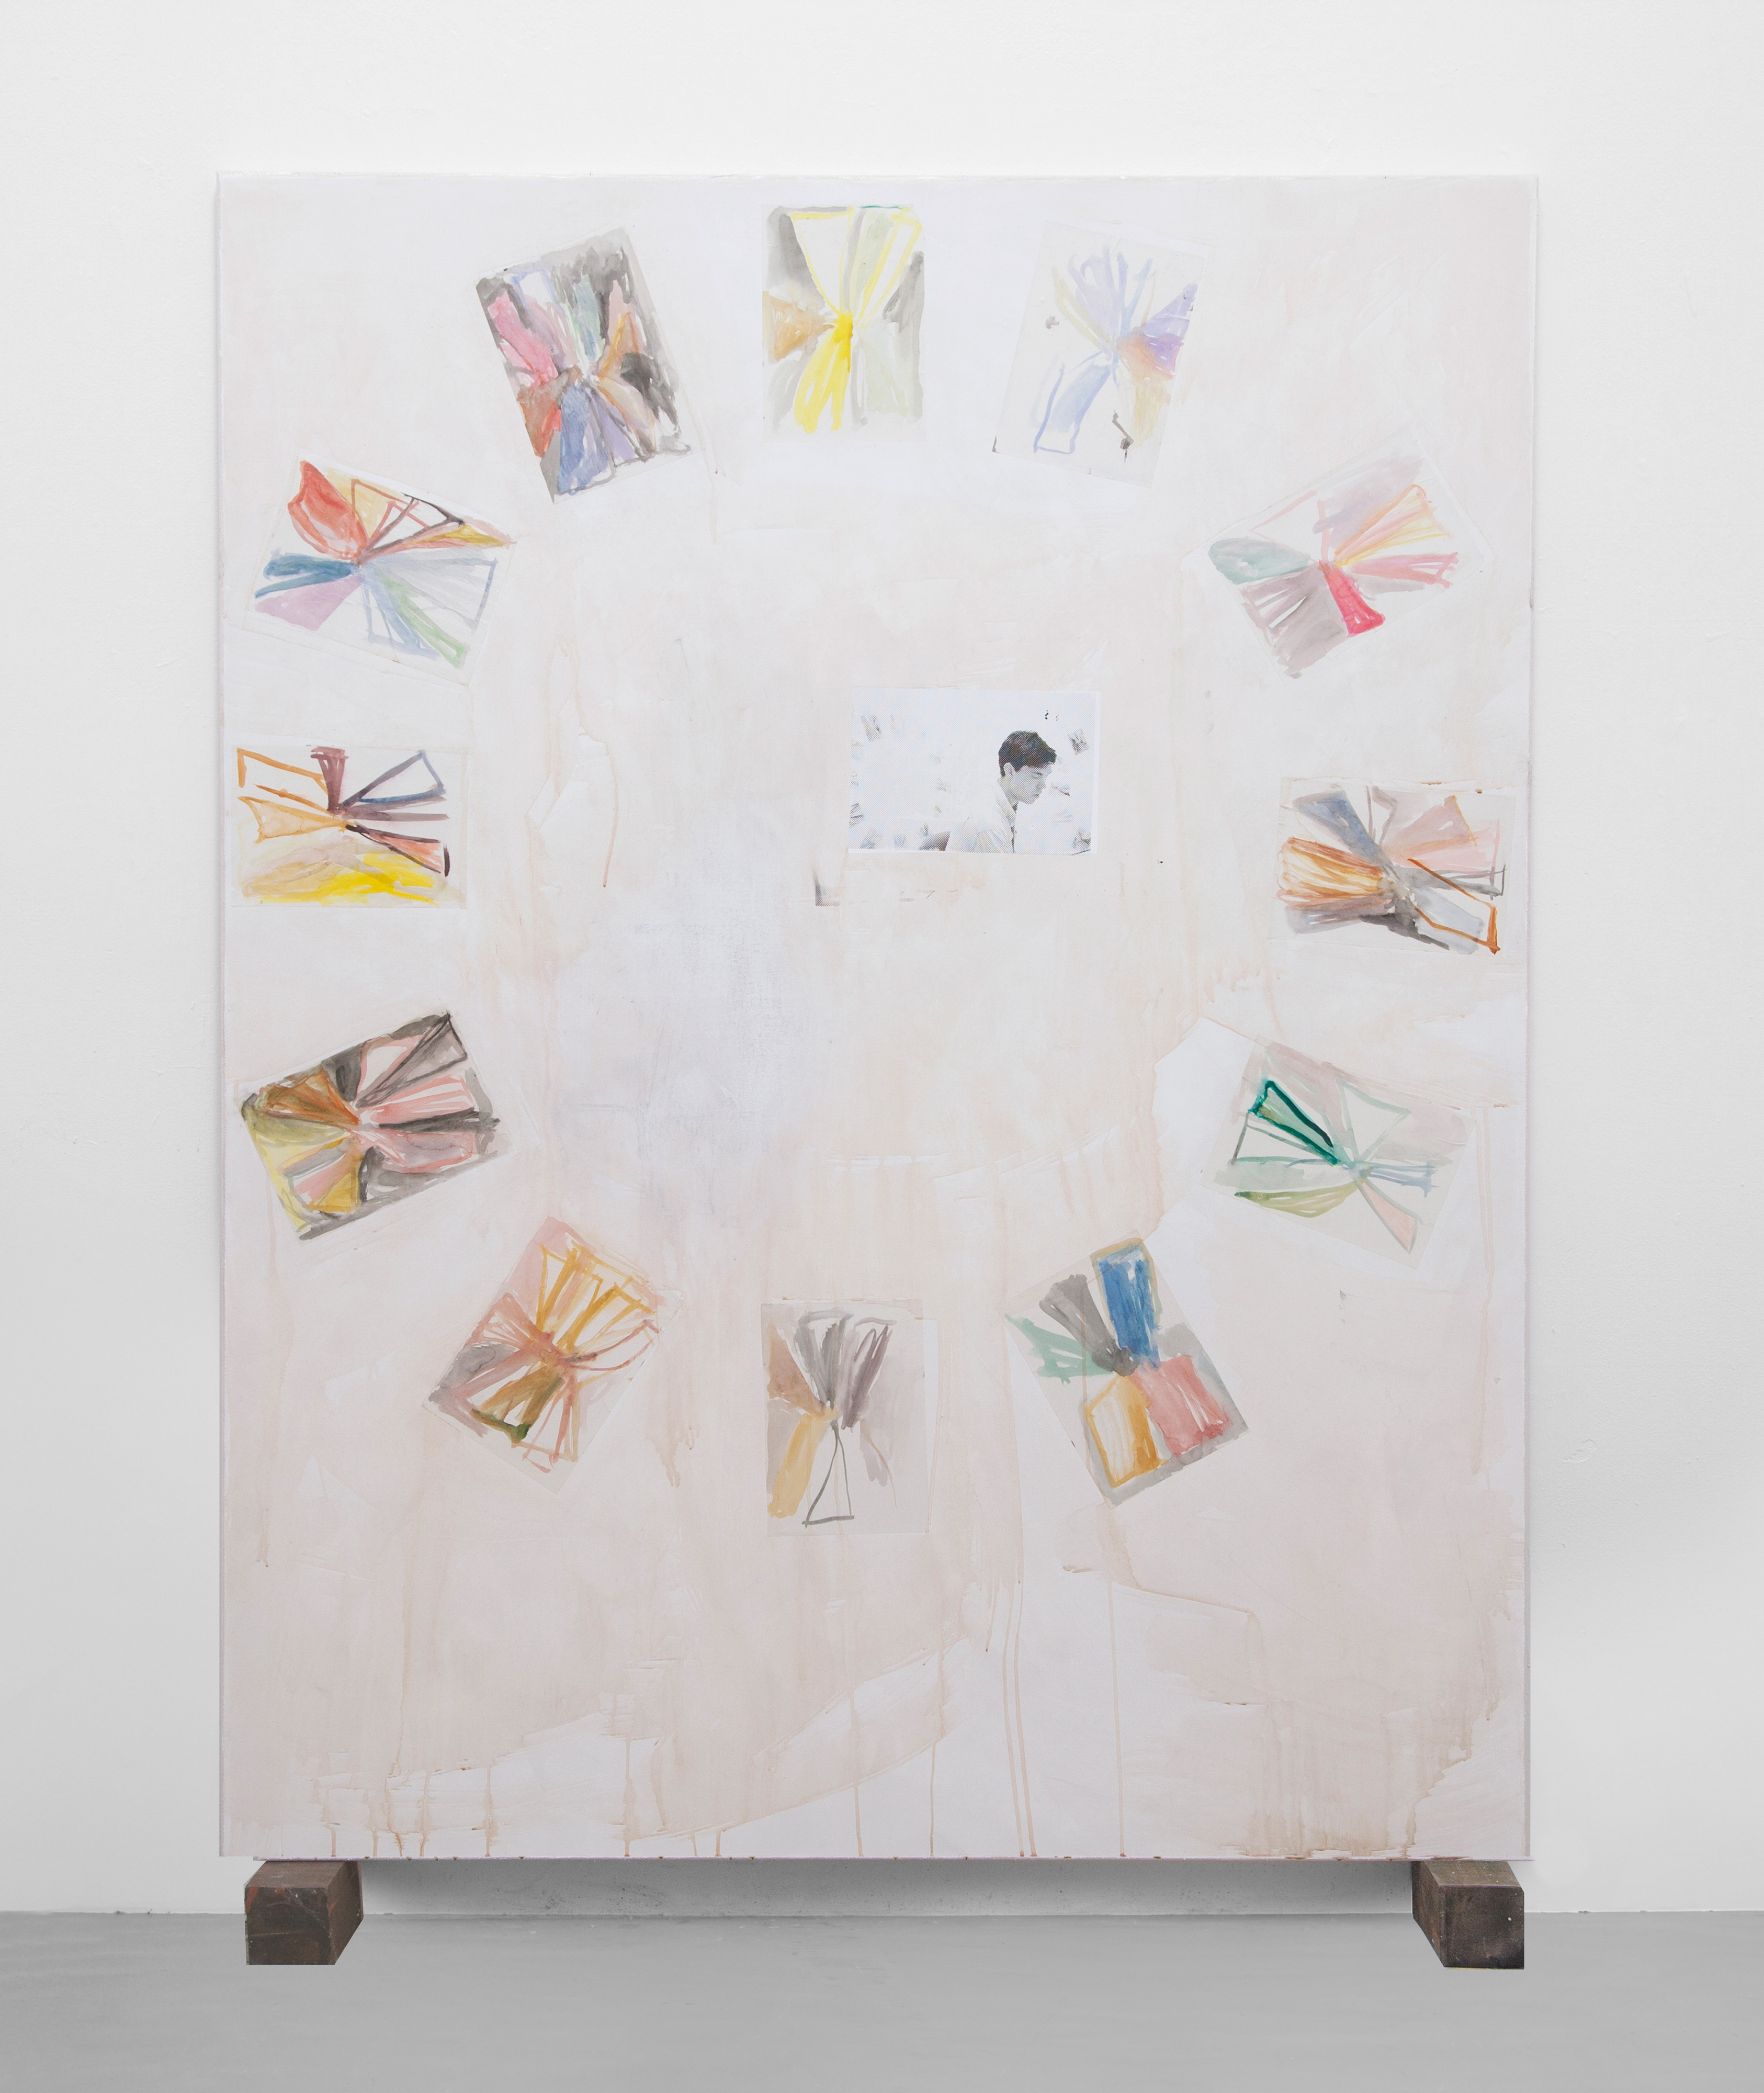 Galerie Barbara Thumm \ New Viewings #17 \ New Viewings #17